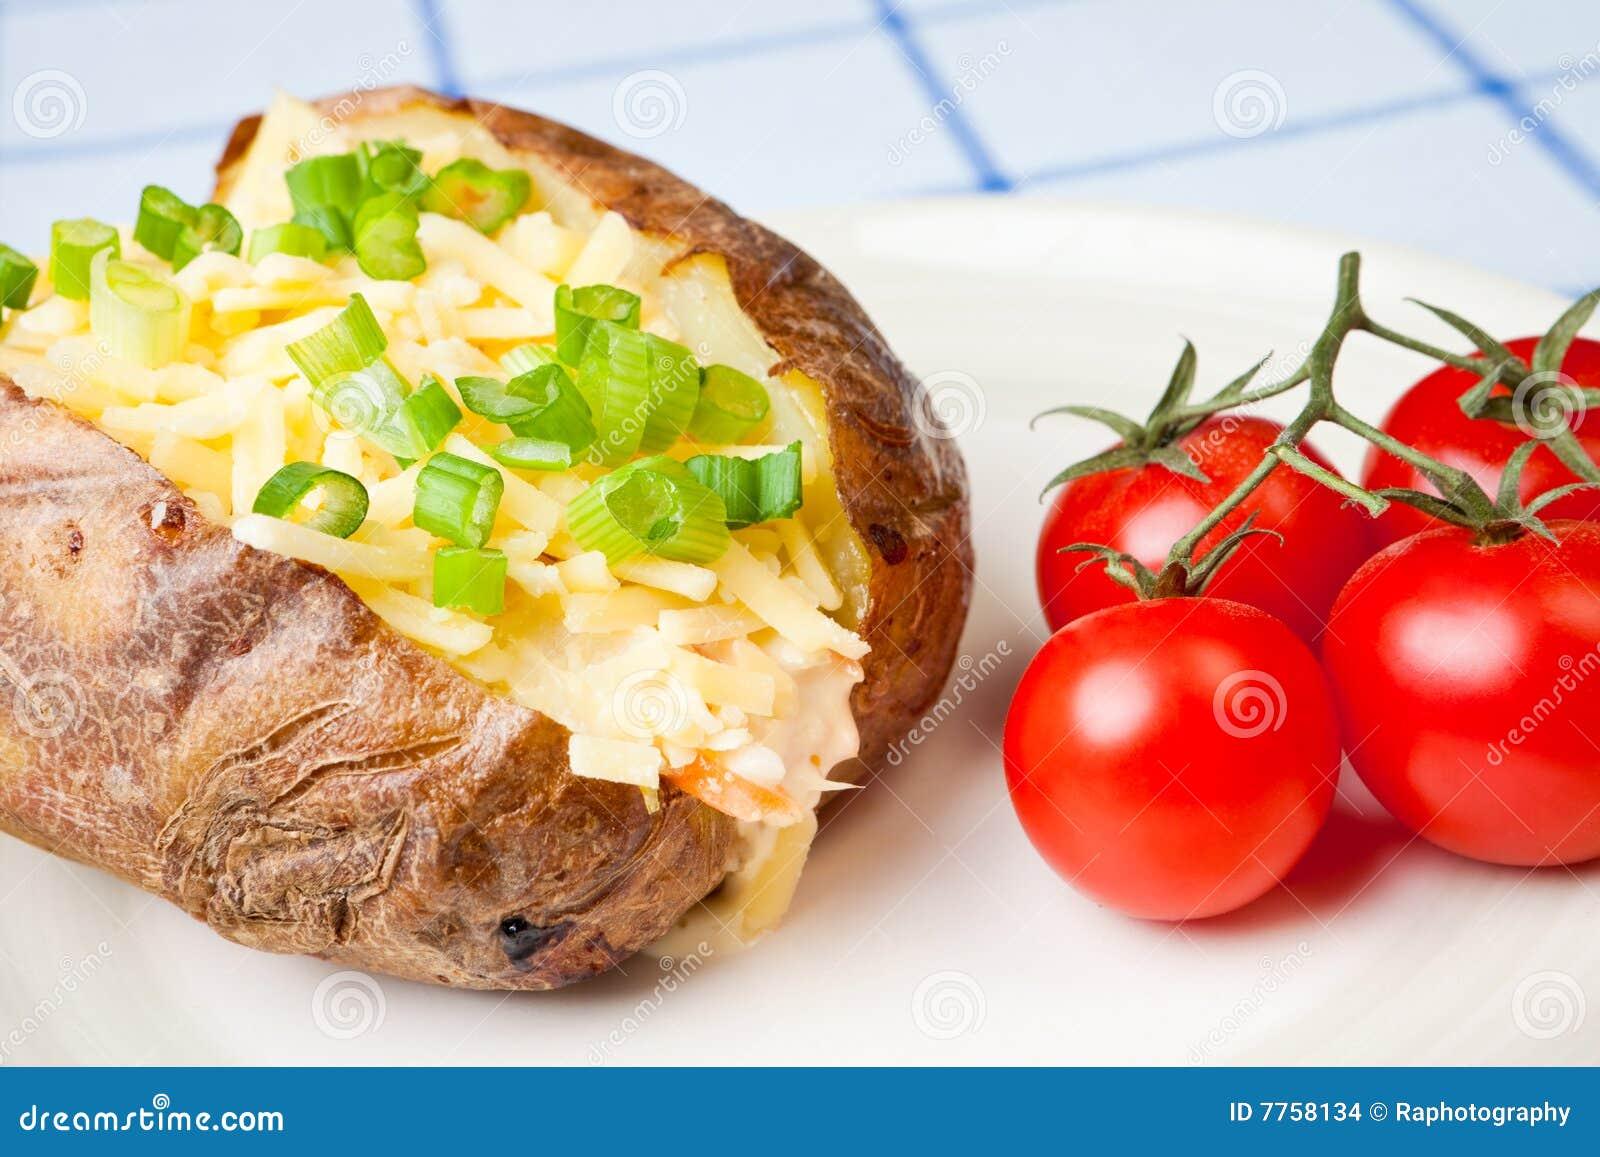 Hete en knapperige aardappel in de schil